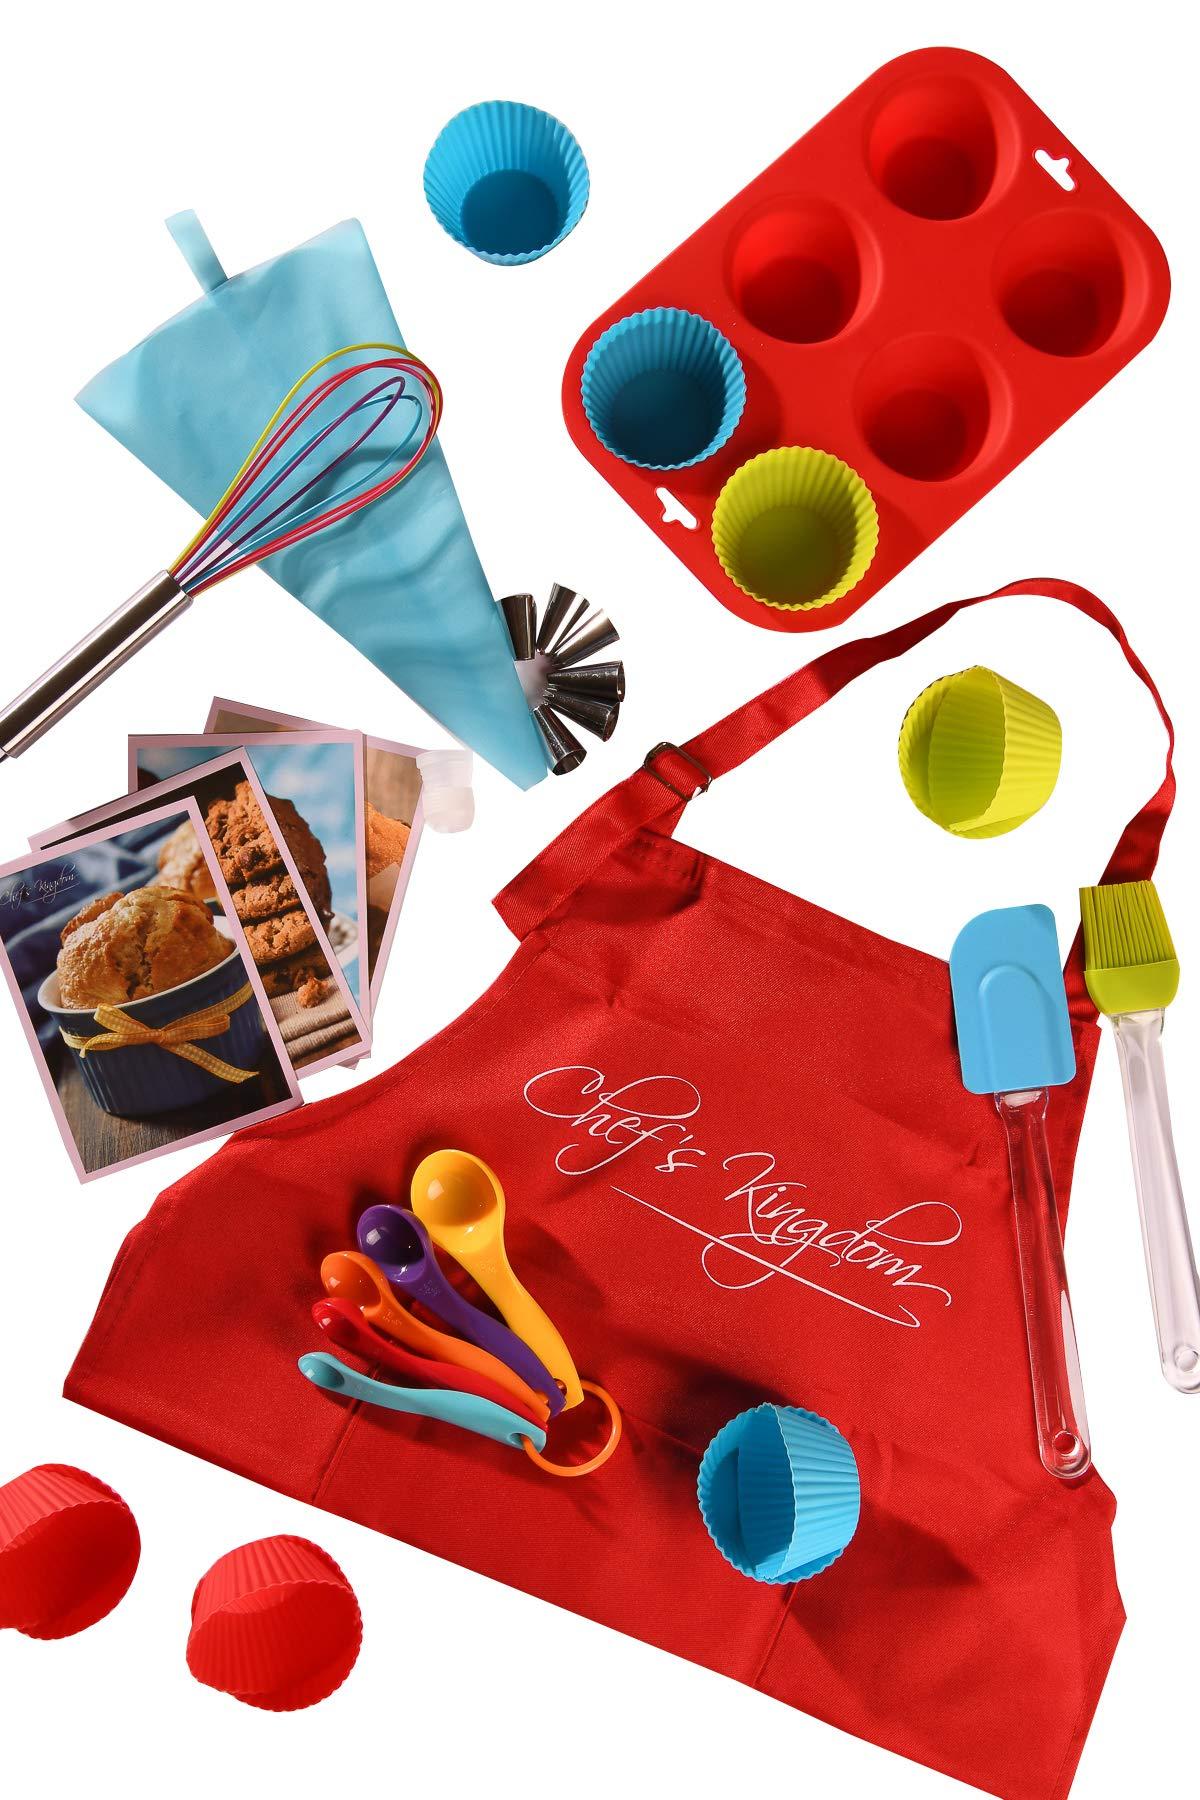 Riki's Kingdom Kids real baking cupcake set with recipes 33-Piece/Child Apron/Muffin Pan/decorating kit, Measuring Spoons,whisk,Spatula,Pastry Brush/Gift Giving Box, FDA Food Grade,Dishwasher safe